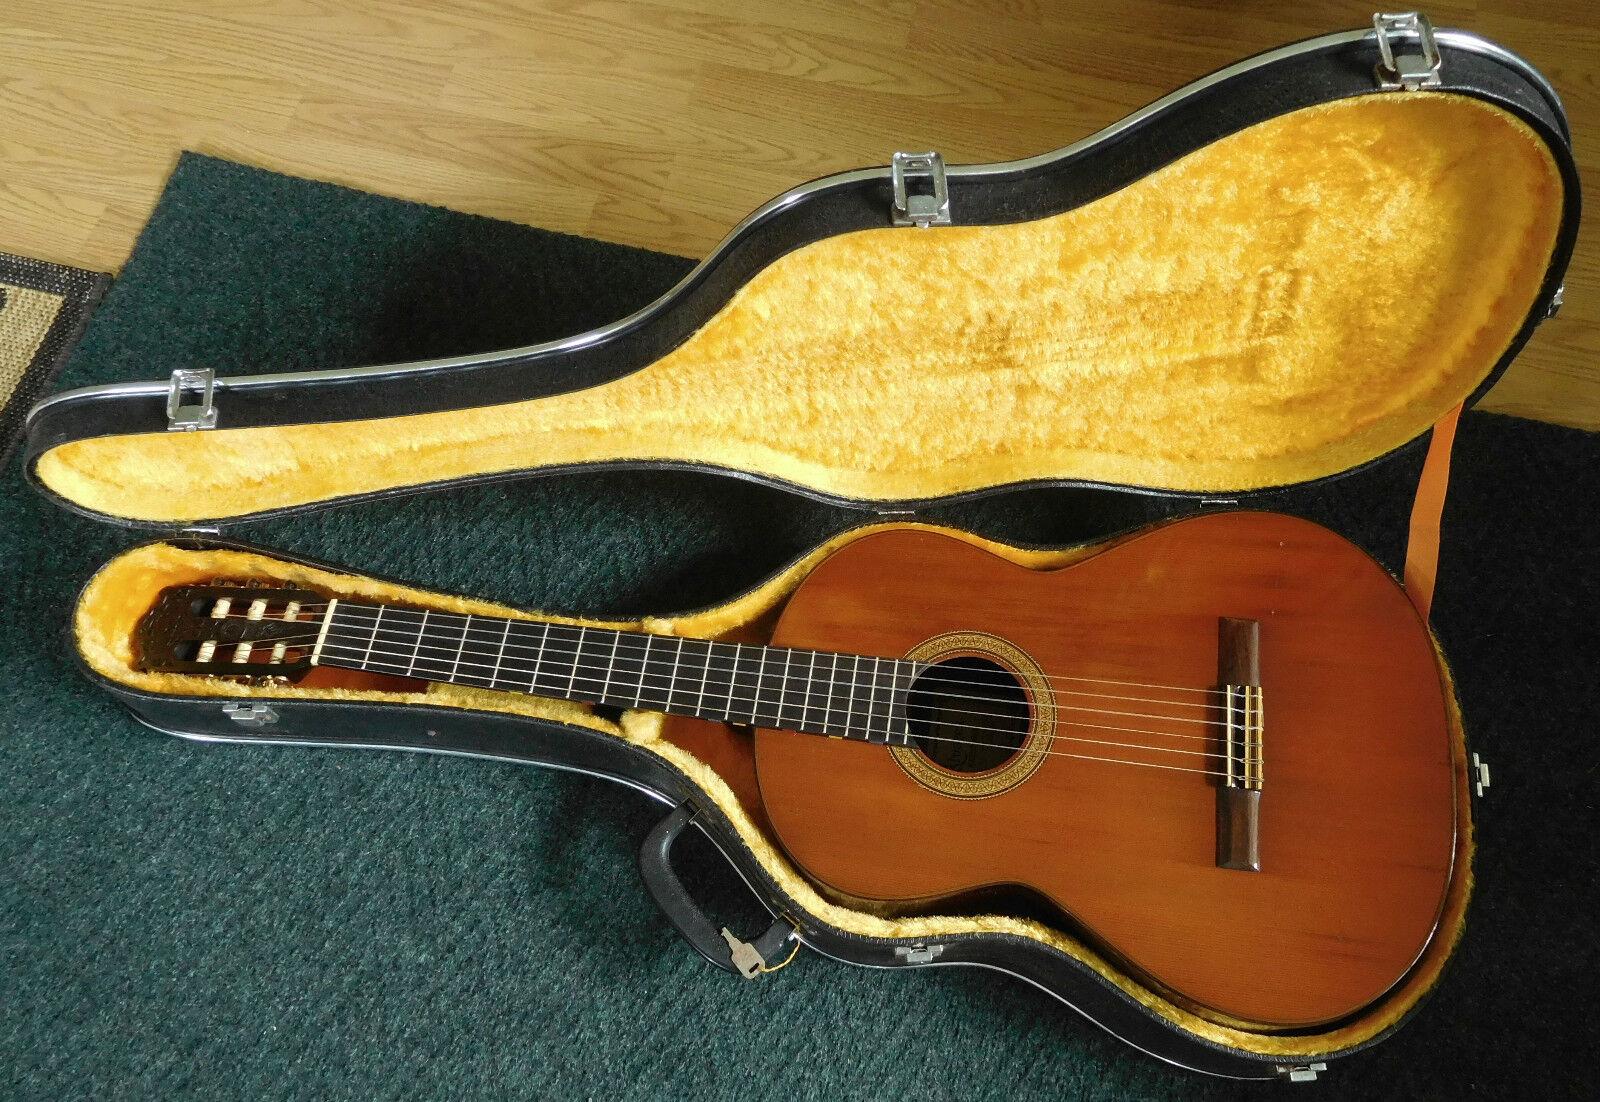 Alvarez Kazuo Yairi Cy-130 Classical Guitar  Coral Rosewood Cedar Top 1974 Case